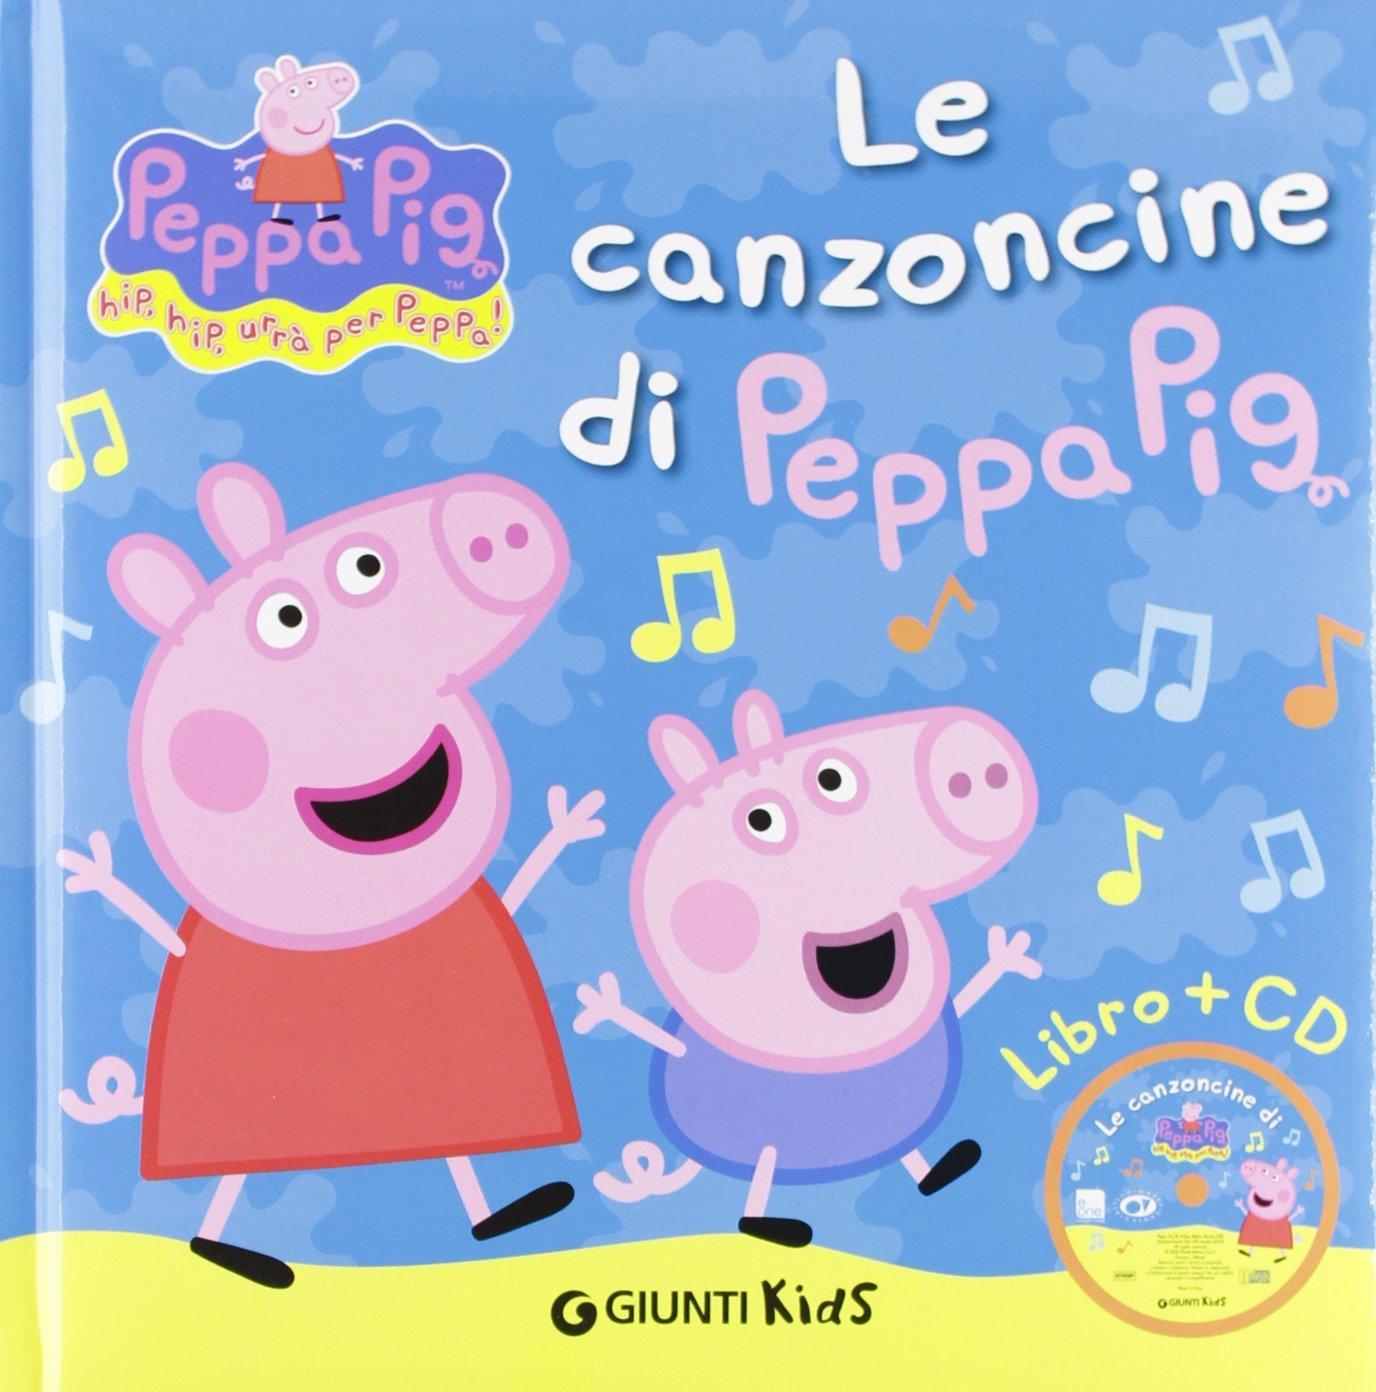 canzoni peppa pig